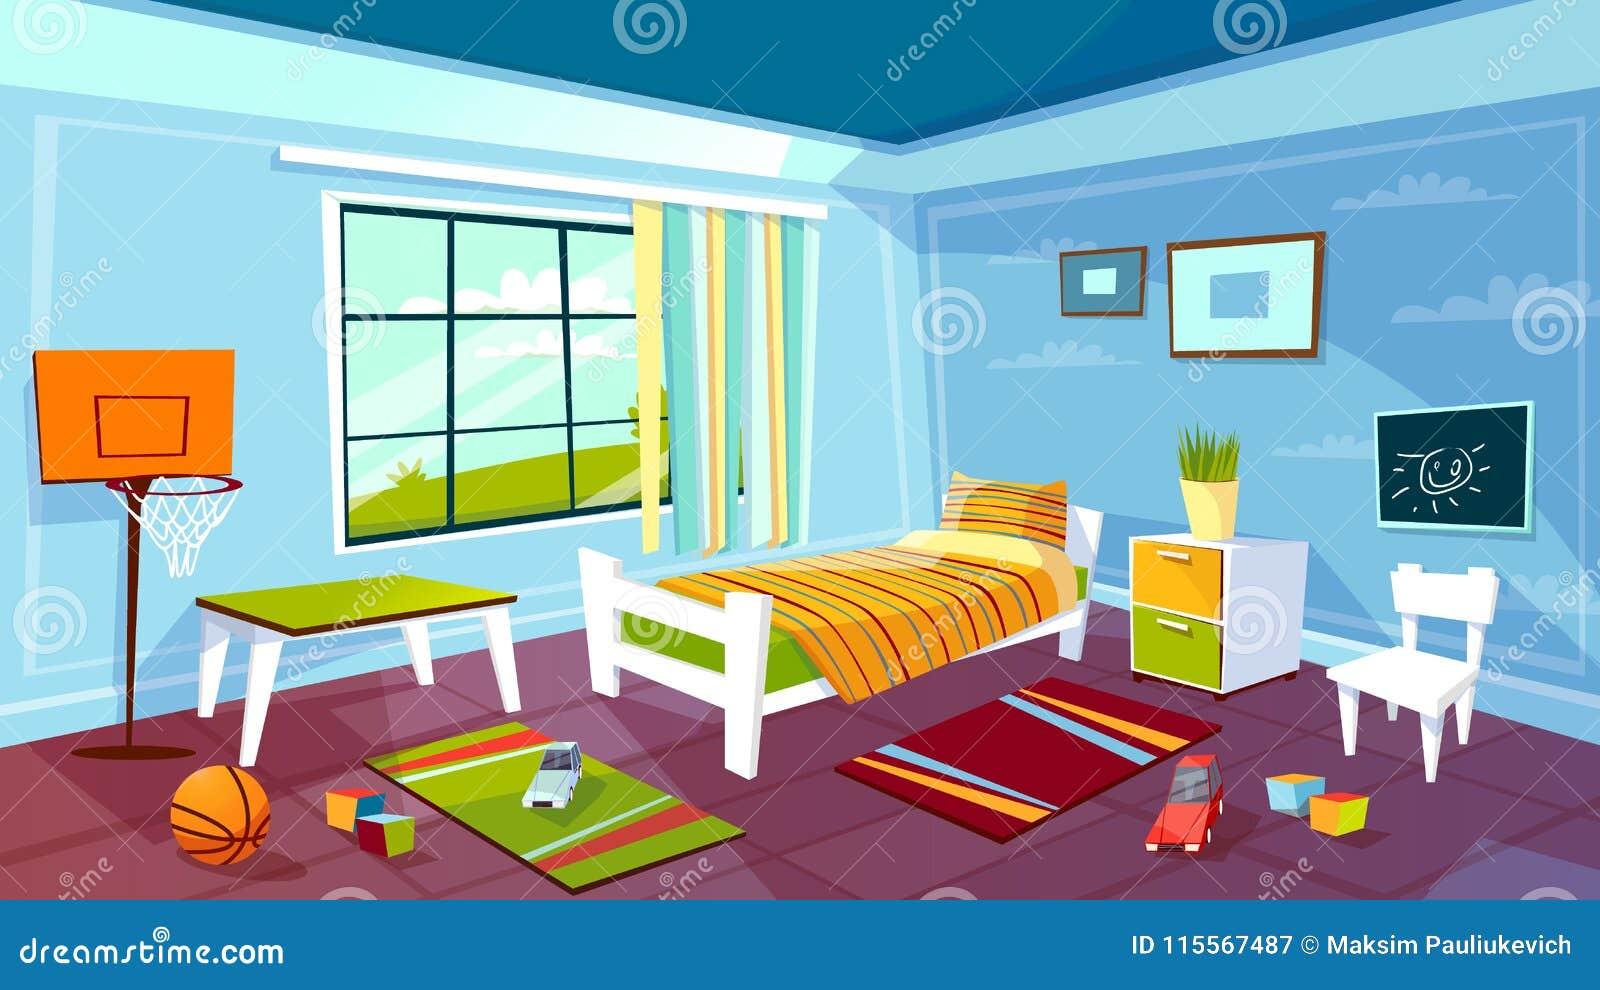 Child Room Vector Illustration Of Kid Boy Bedroom Interior Background.  Cartoon Flat Design Of Teen Children Room Furniture Bed, Drawer And Chair  On Carpet, ...